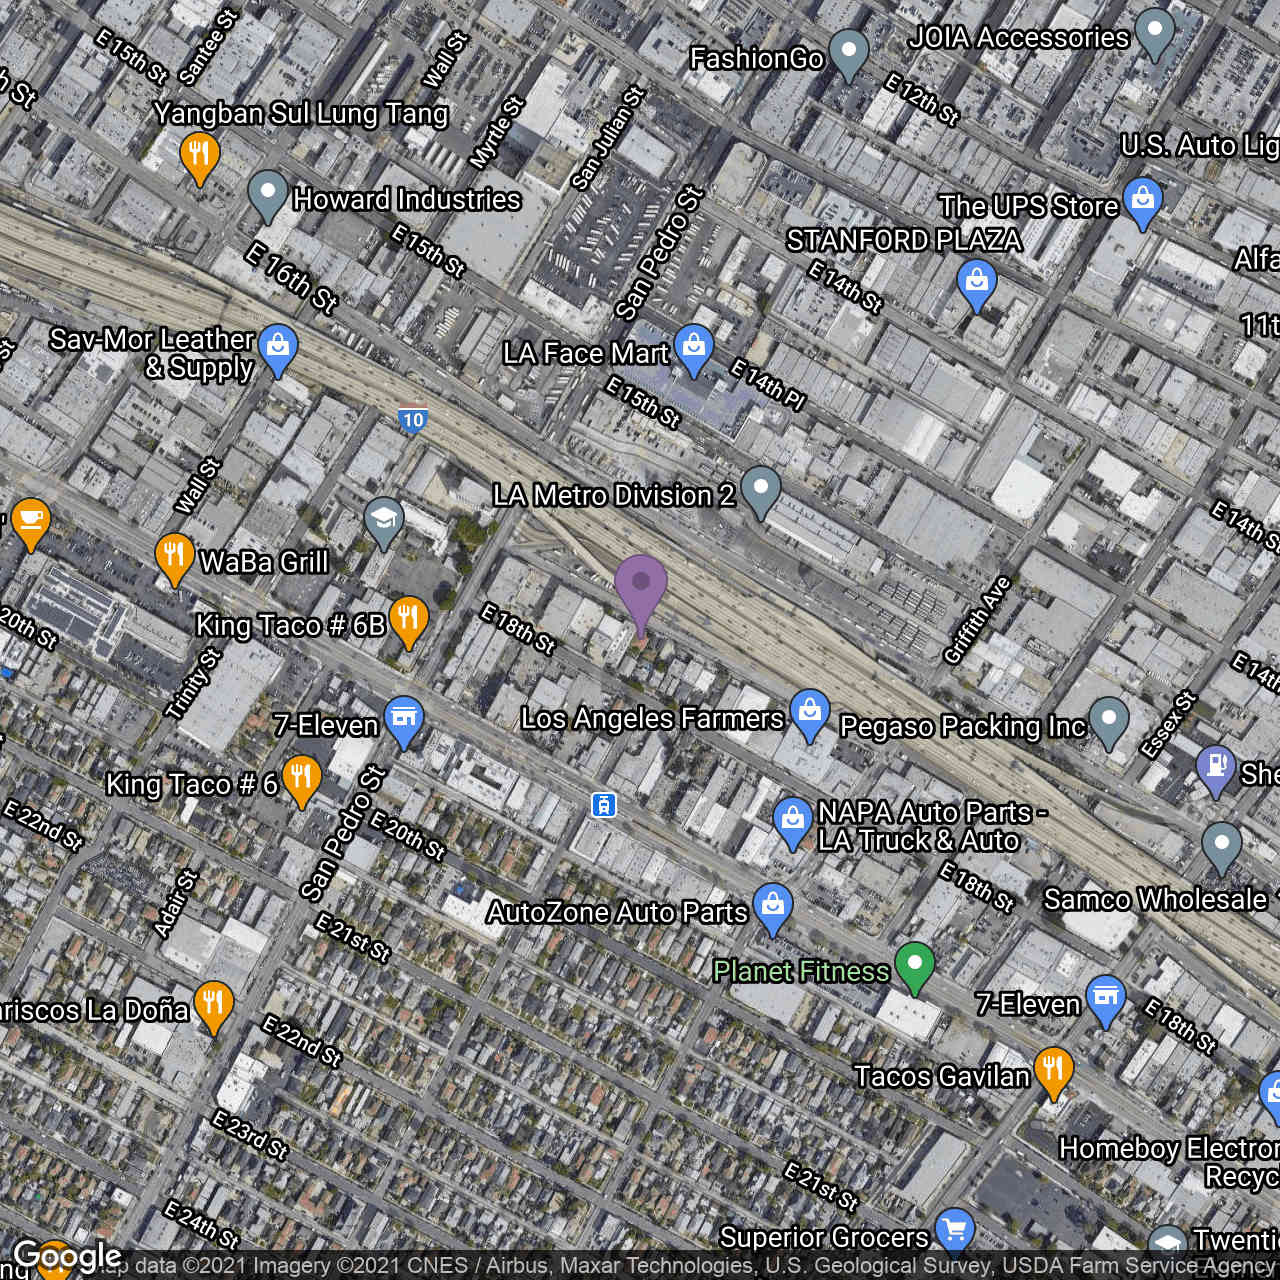 752 E 17th St., Los Angeles, CA, 90021,